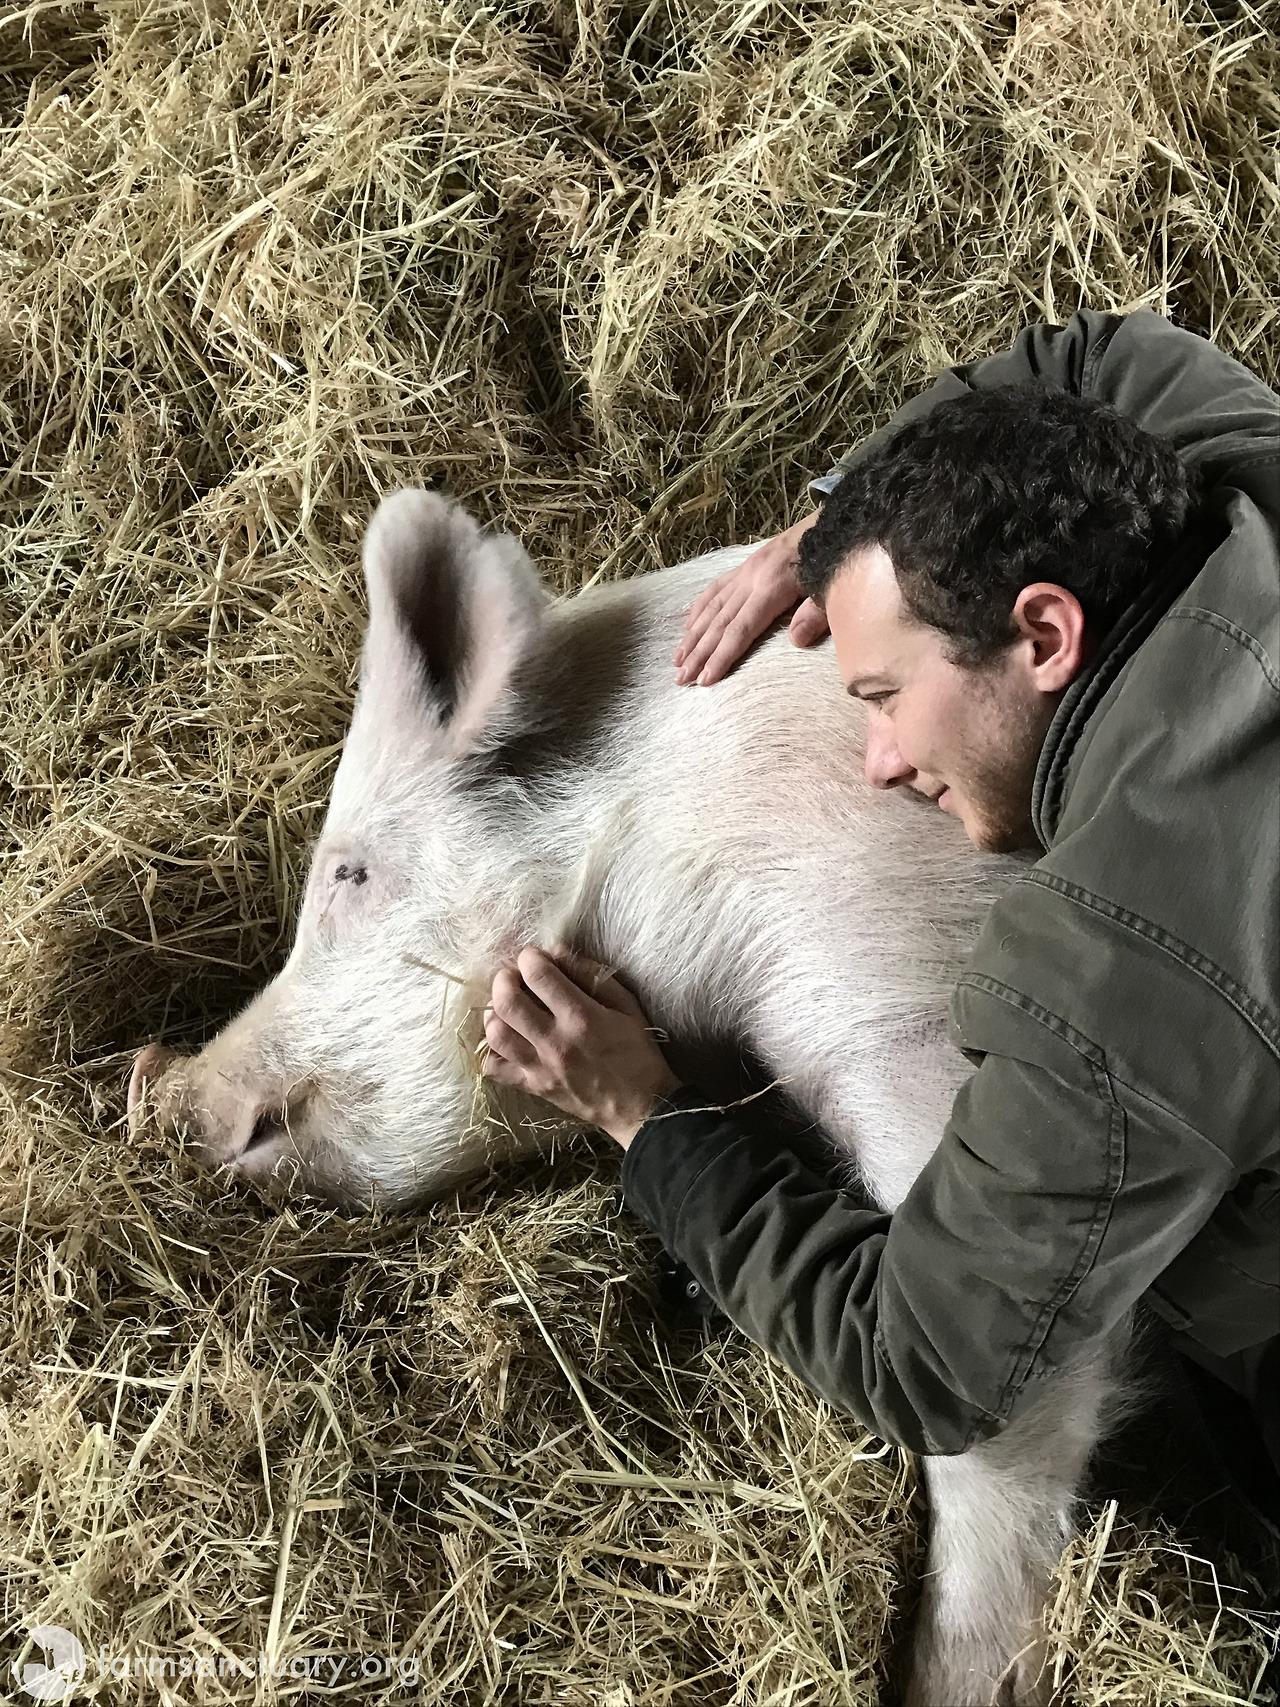 Pigs, like Bob Harper, tend to make good farm animal ambassadors because they're affectionate, sensitive, and smart.